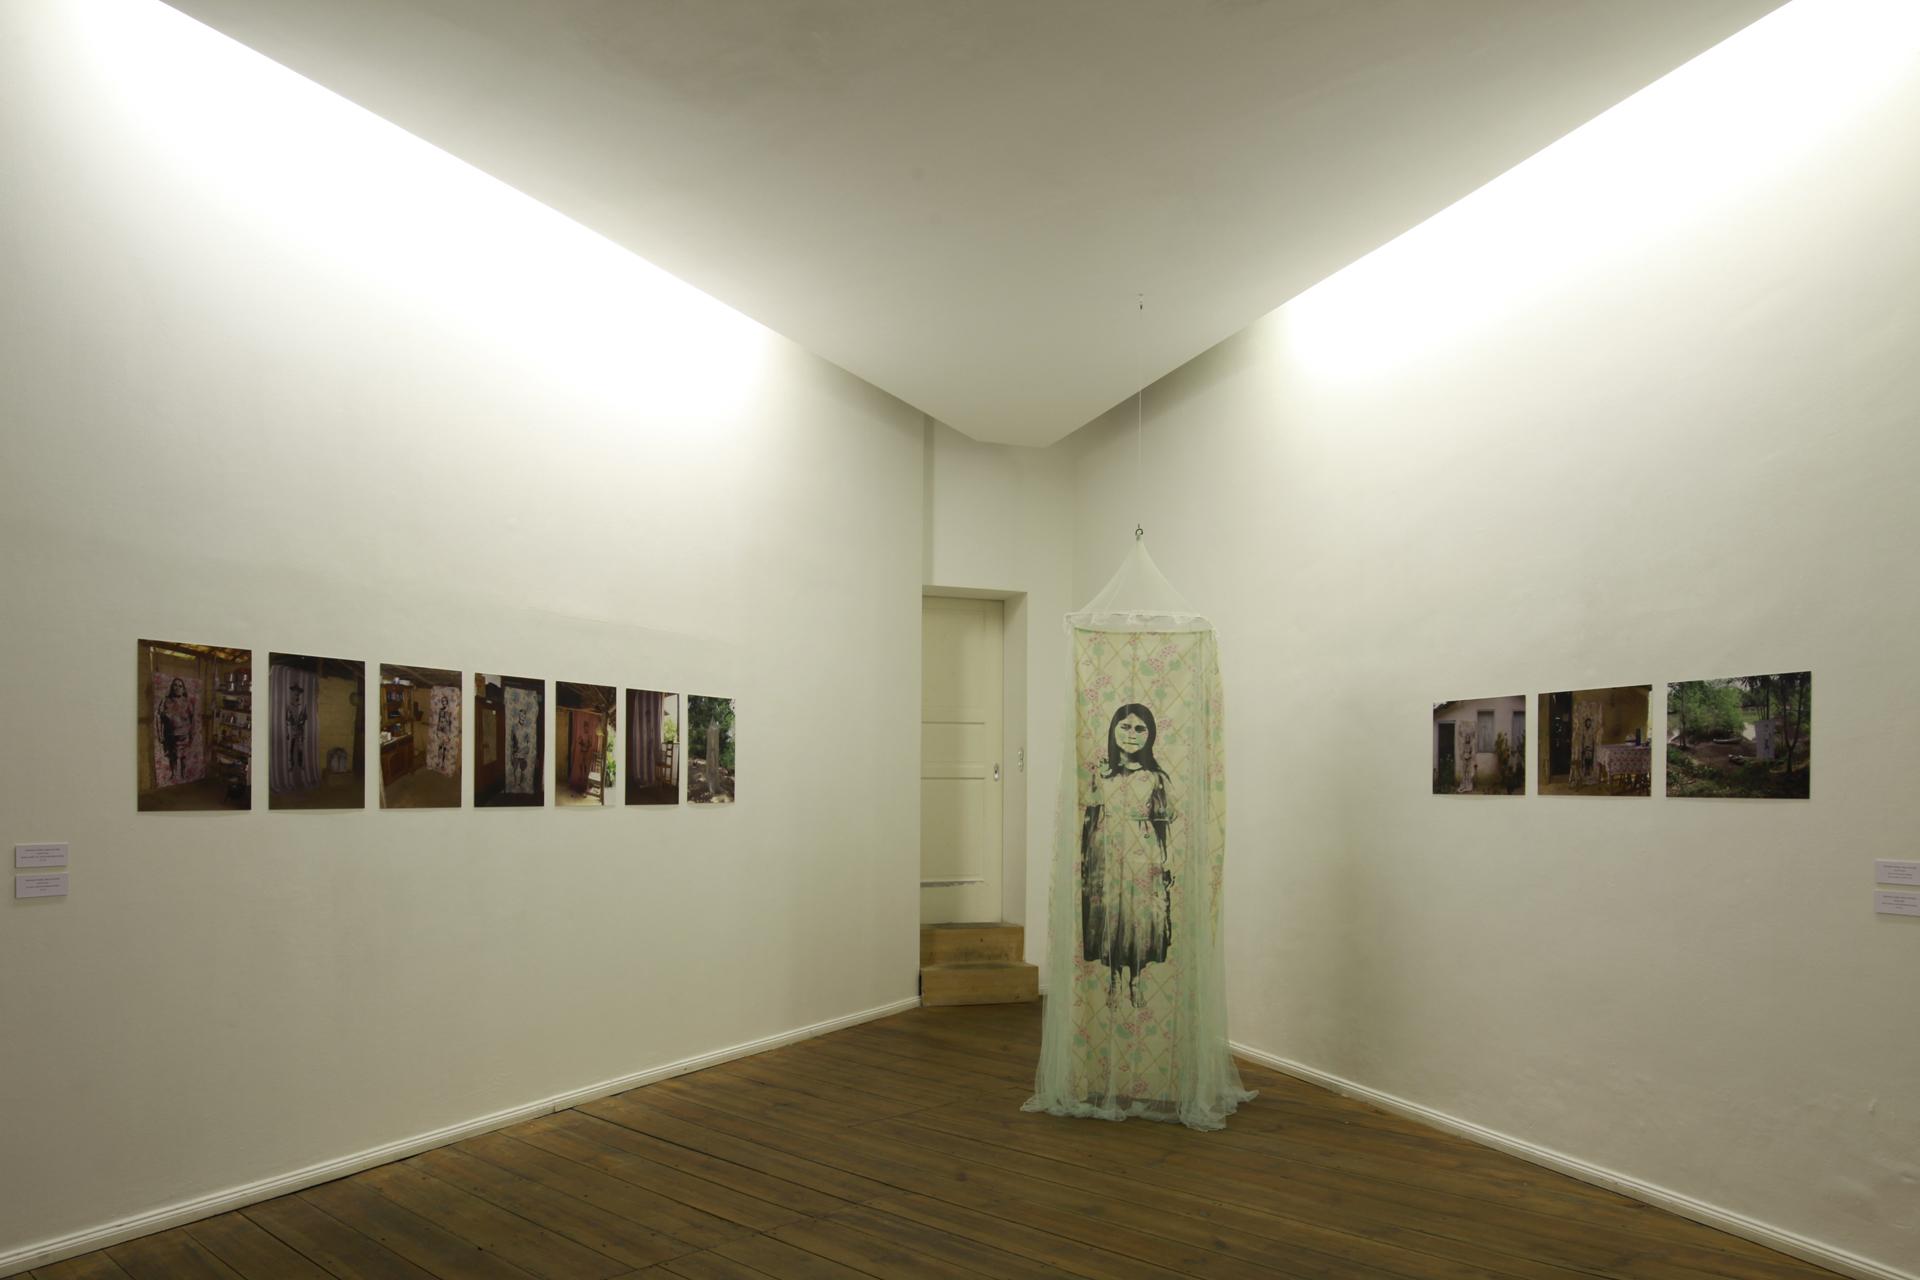 2016_juef_kurator_grimmuseum_27-alexandre-sequeira